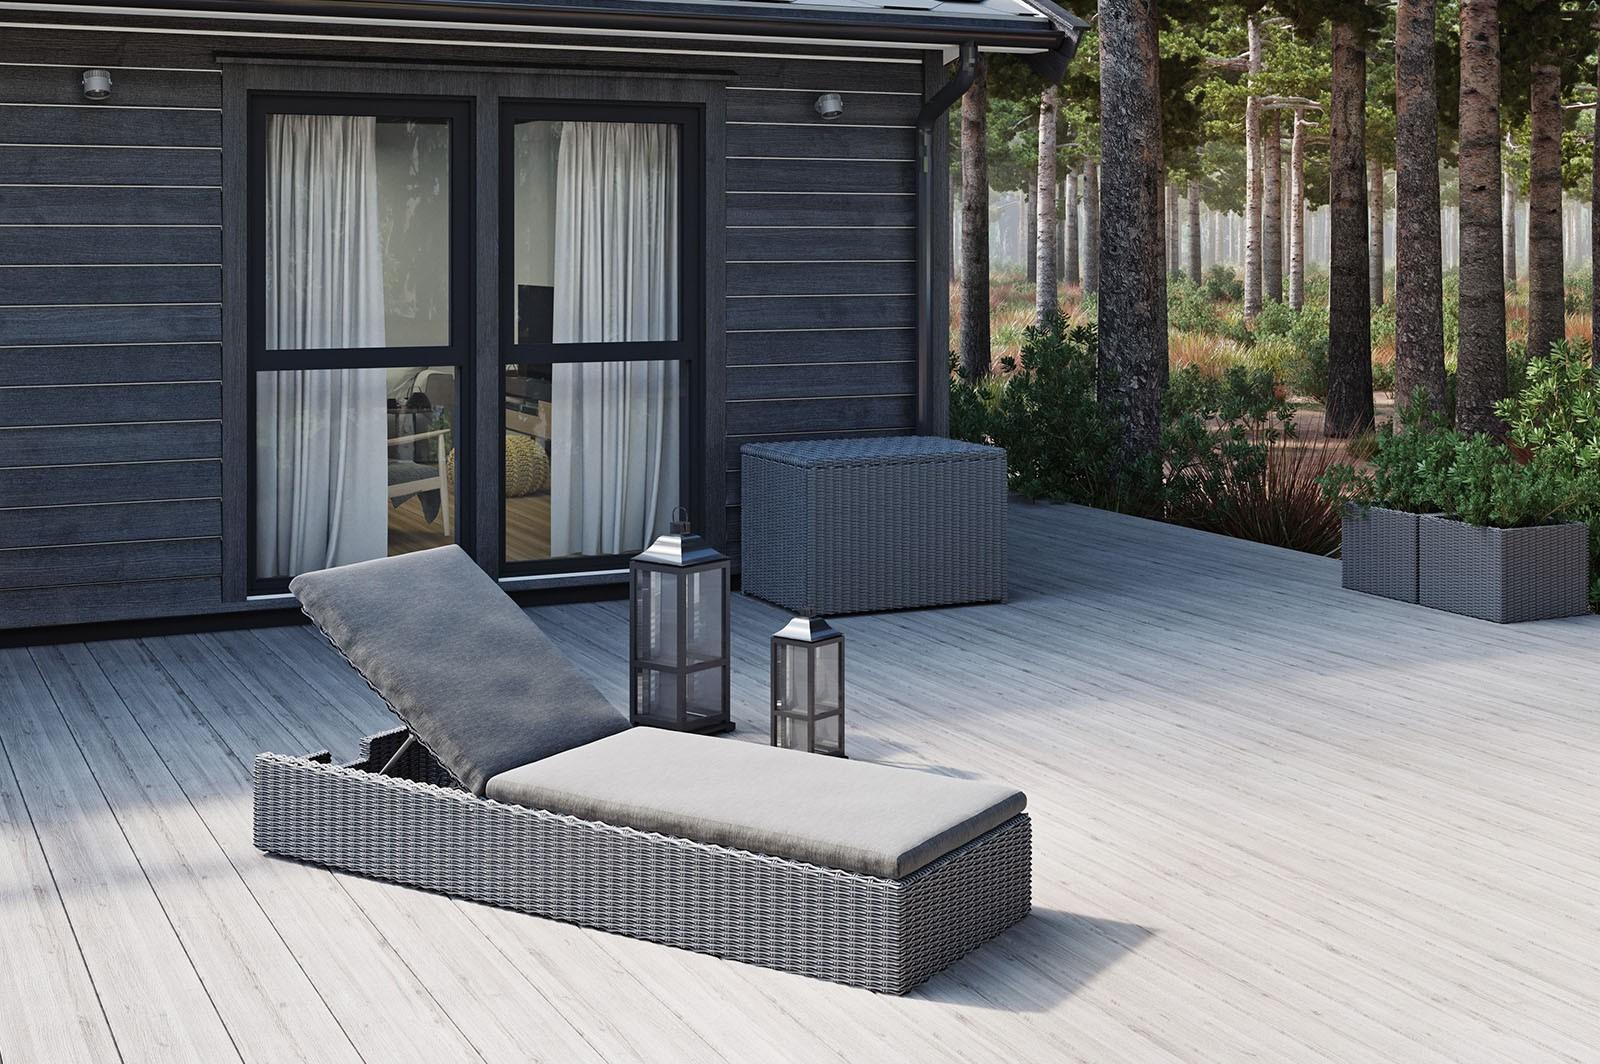 Leżak na balkon – prosty sposób na relaks